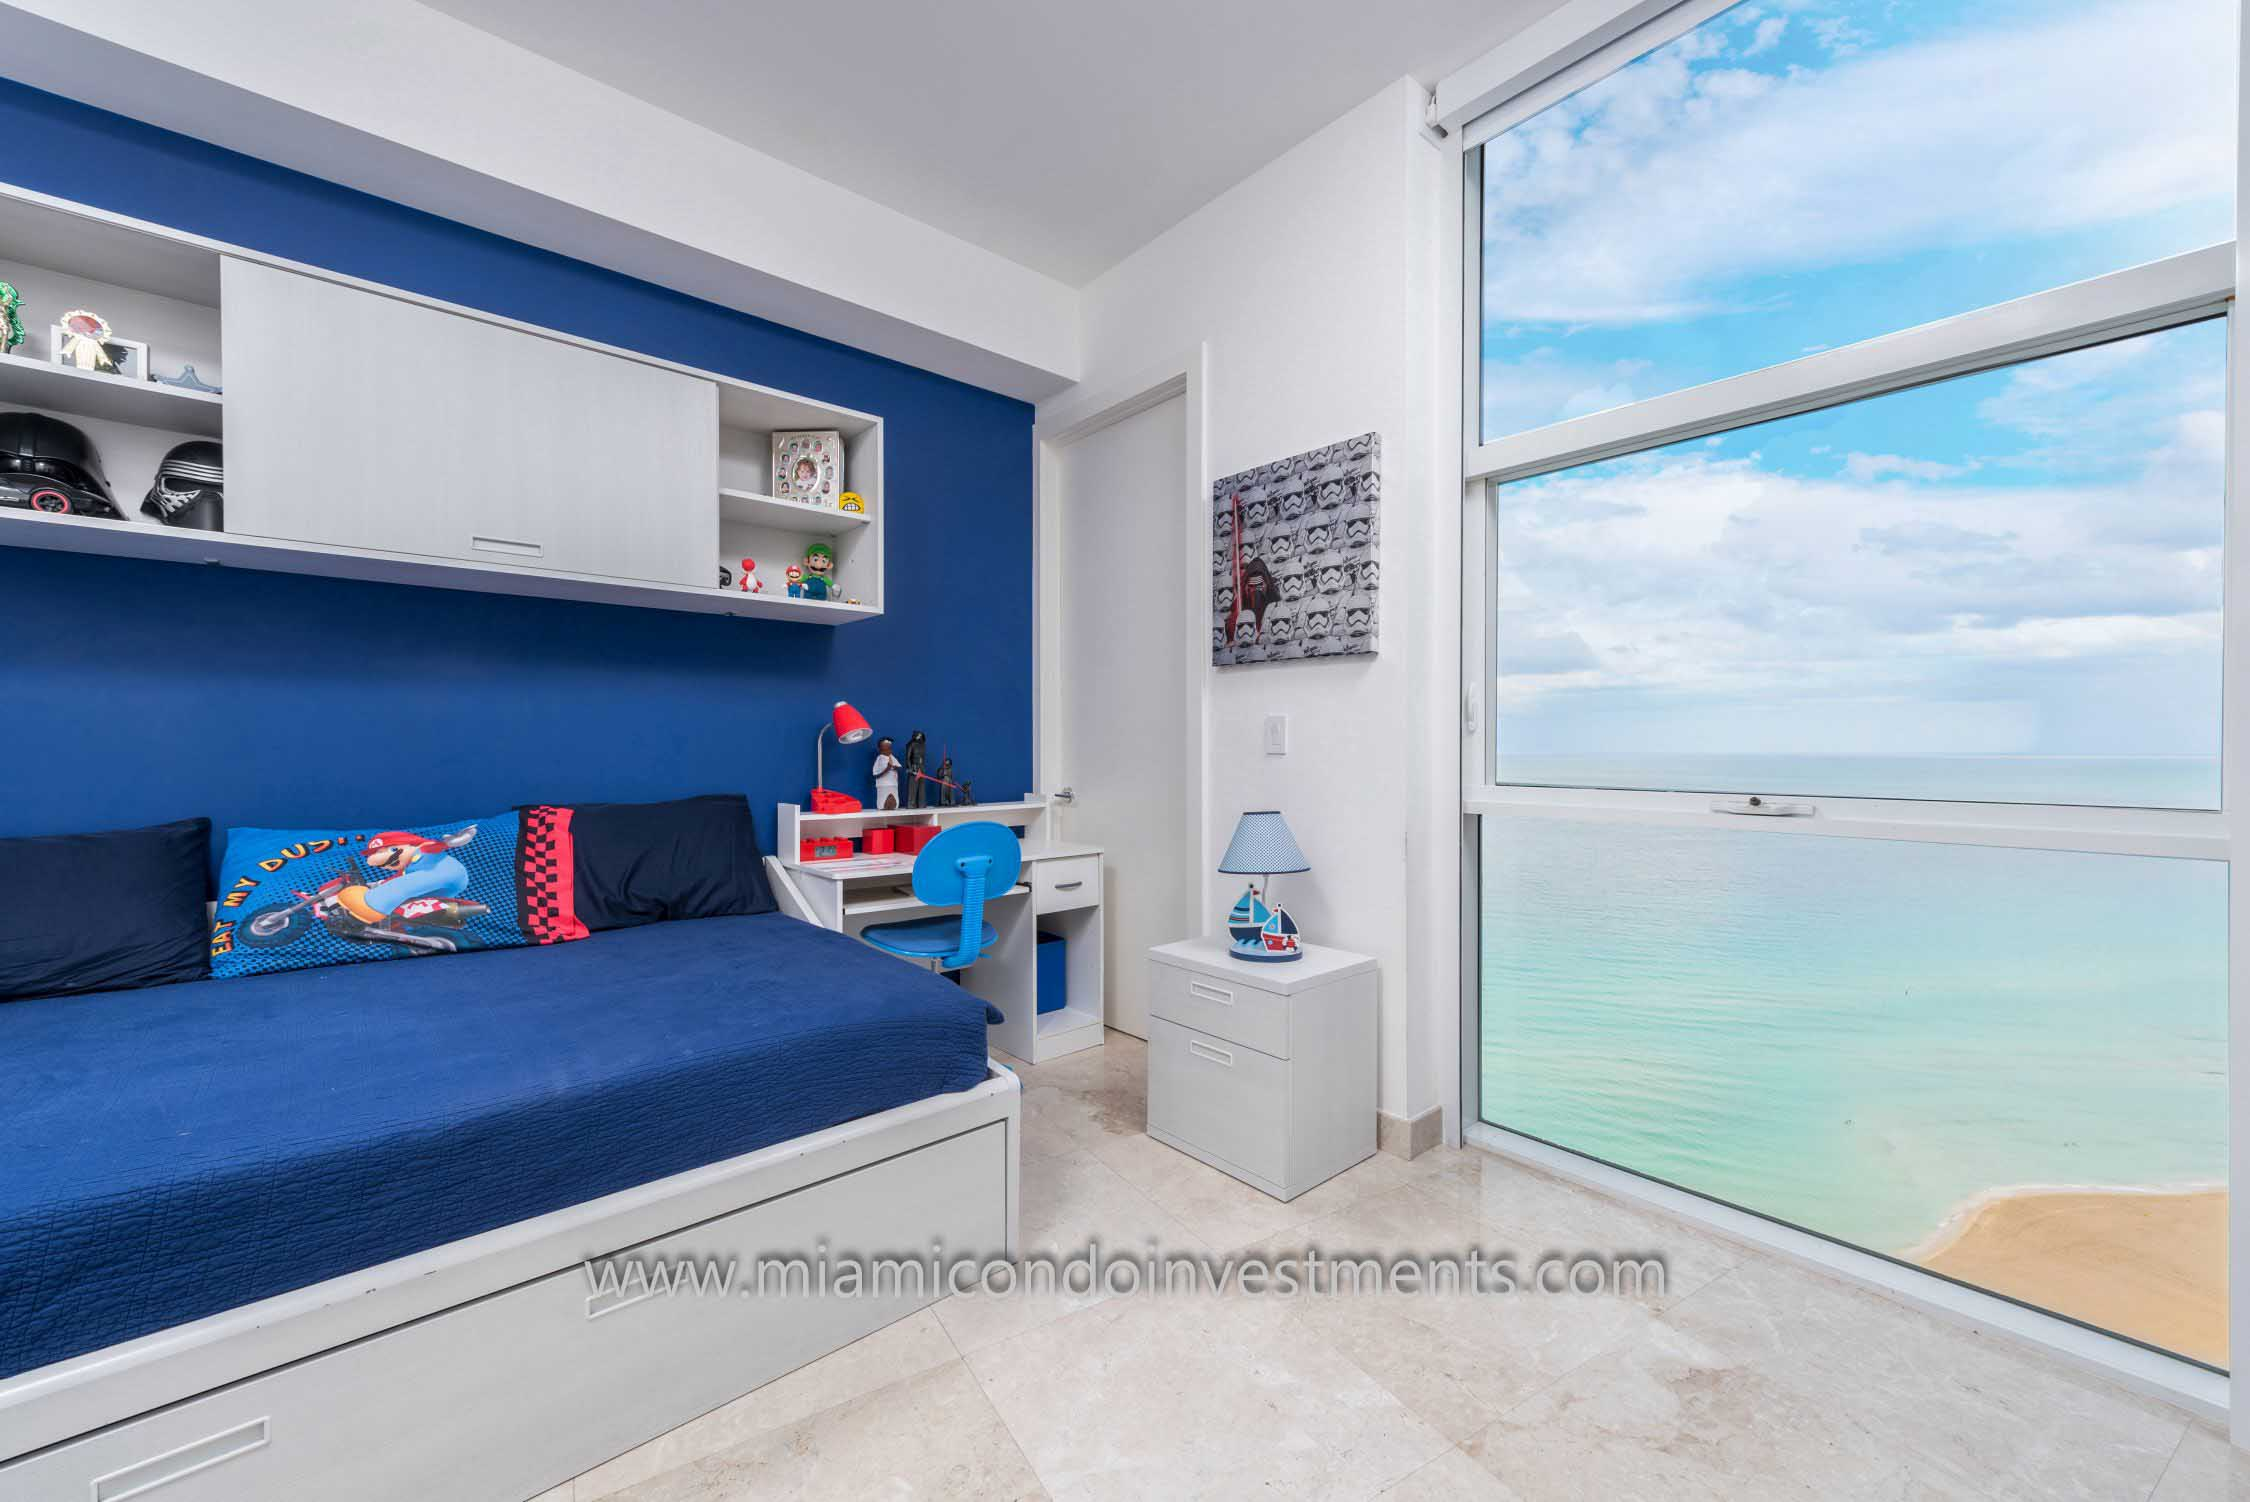 trump-palace-unit-3604-sunny-isles-beach-22